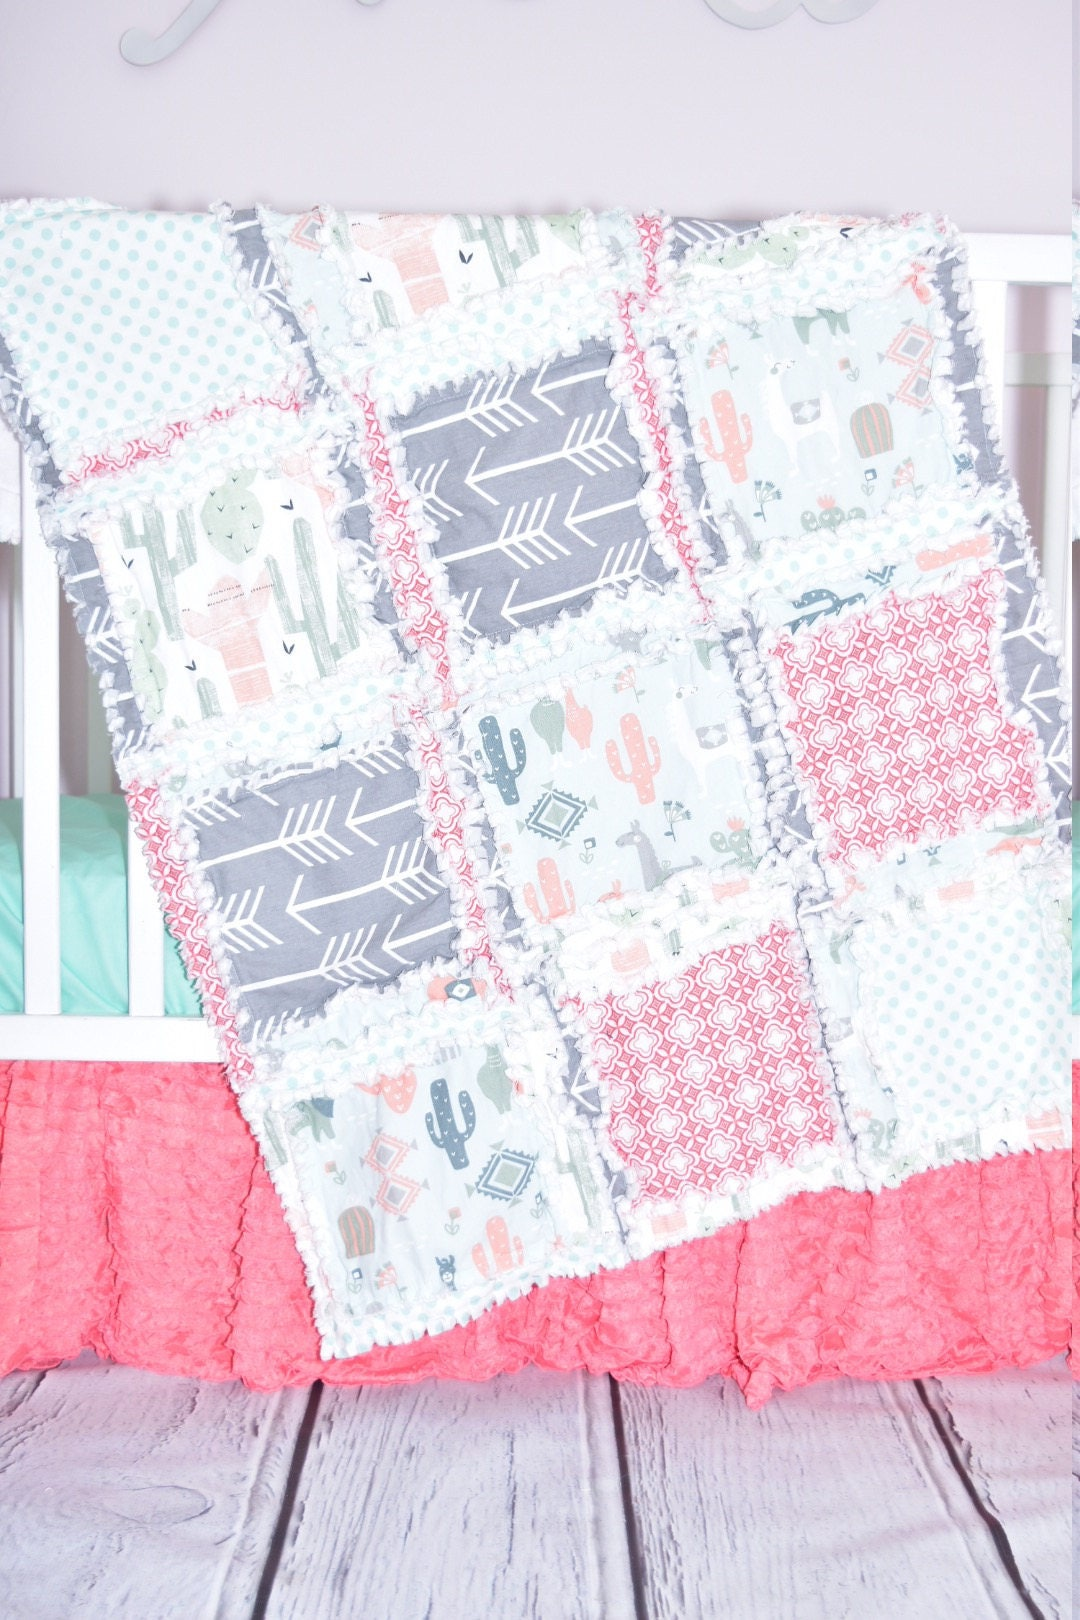 Mint 7pcs Unicorn Conical Gradient Color Makeup Brushes: Llama Blanket Coral/ Gray/ Mint Crib Bedding Cactus